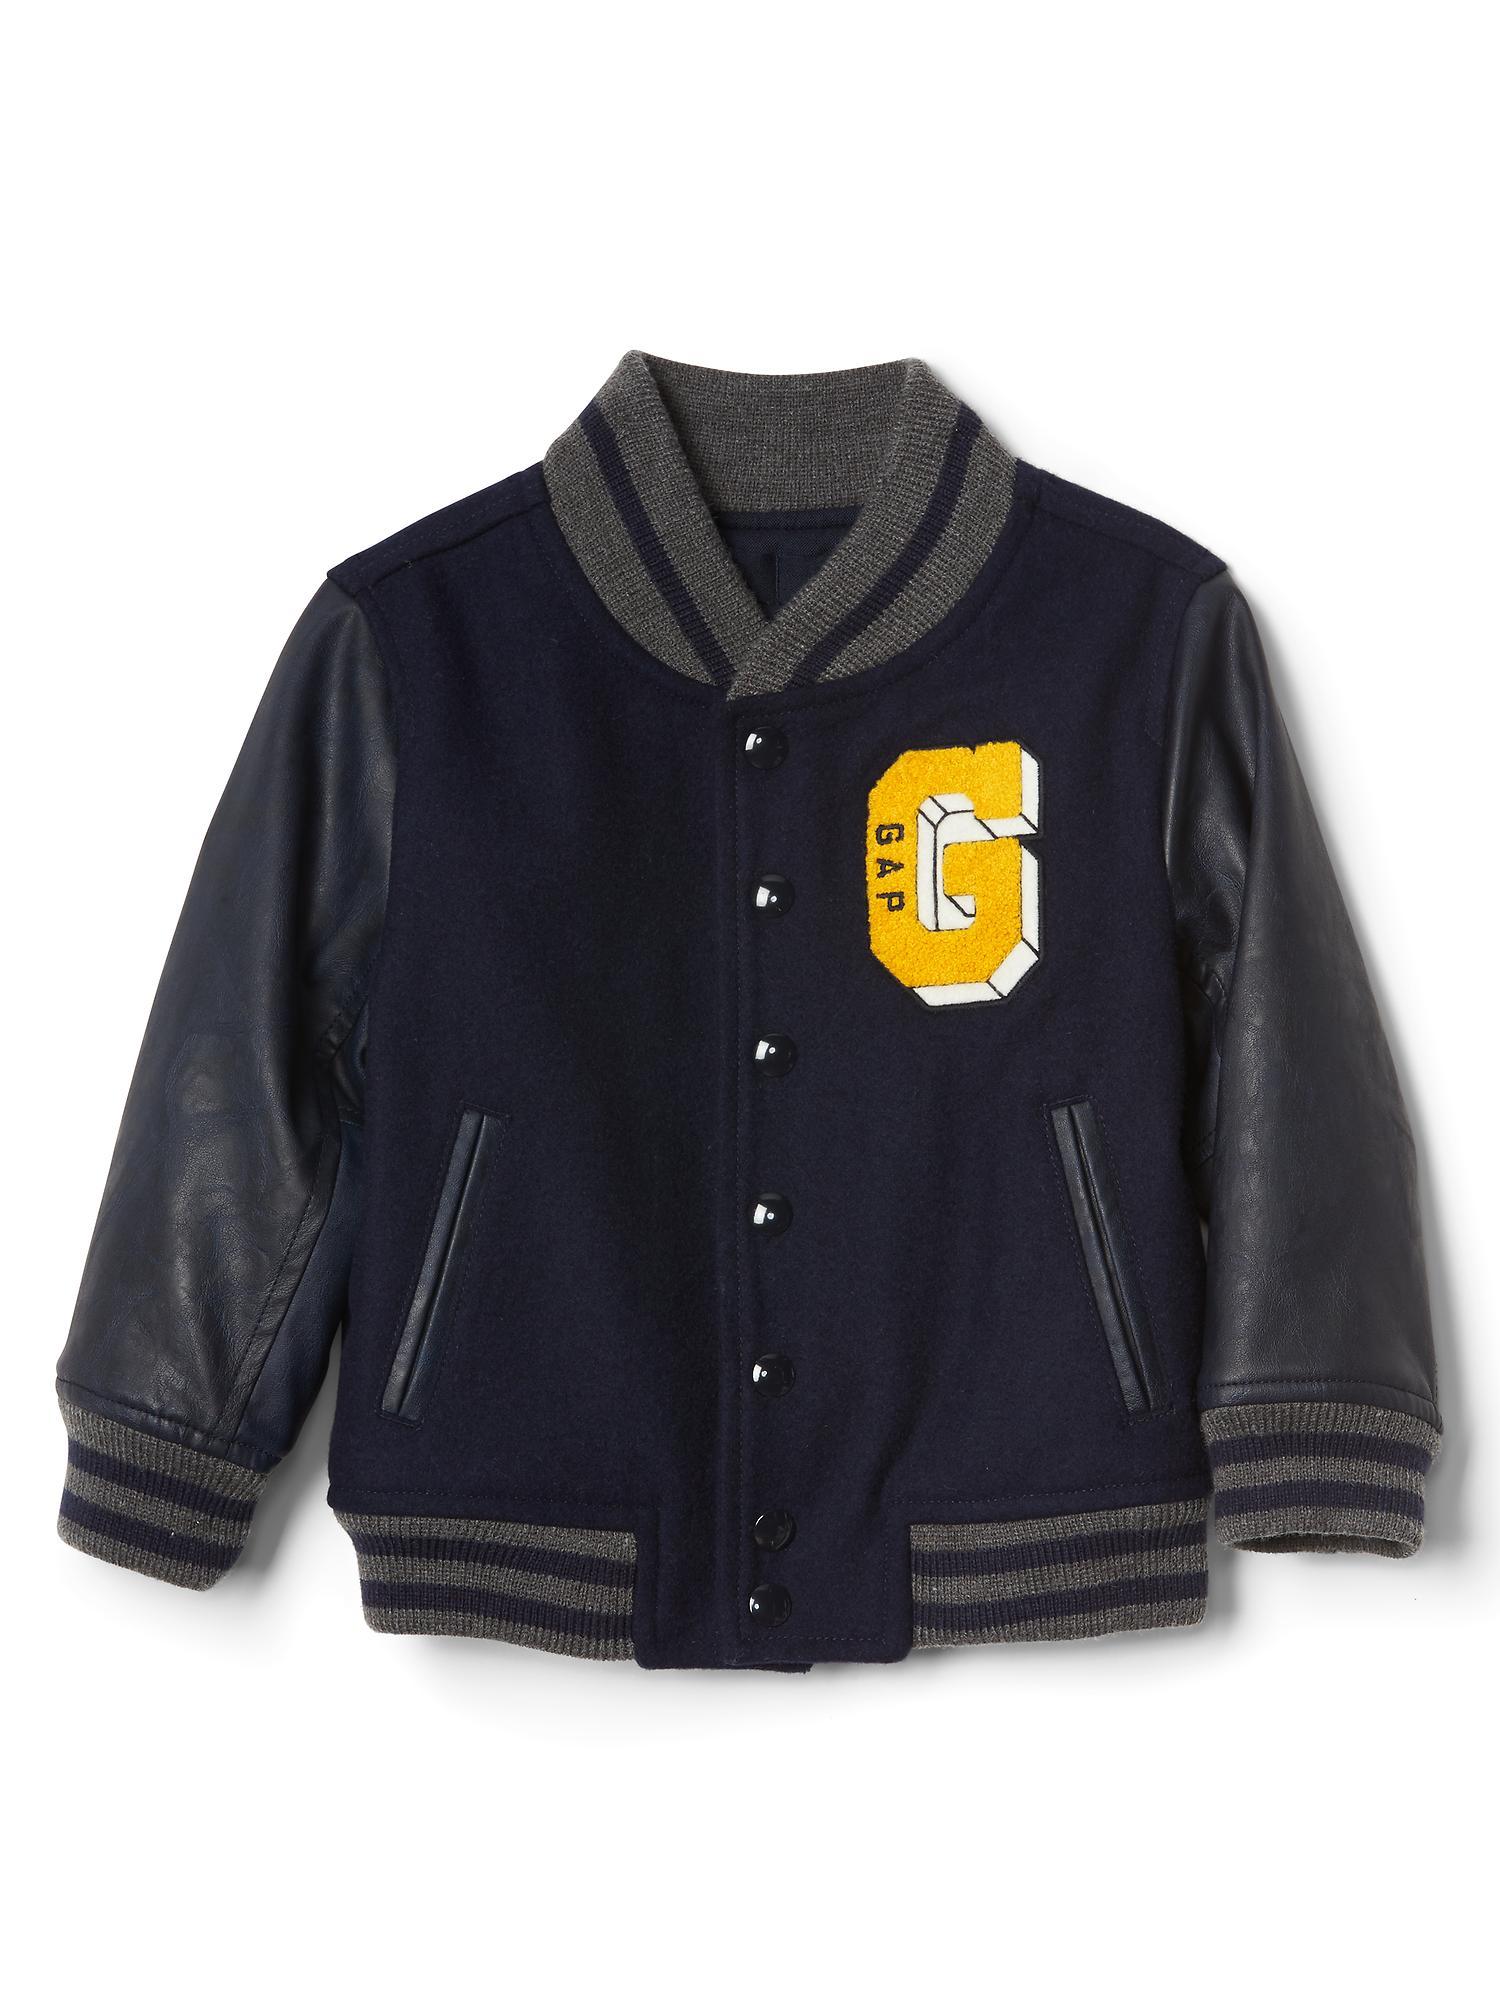 c3e1f1c7557d Faux leather varsity jacket